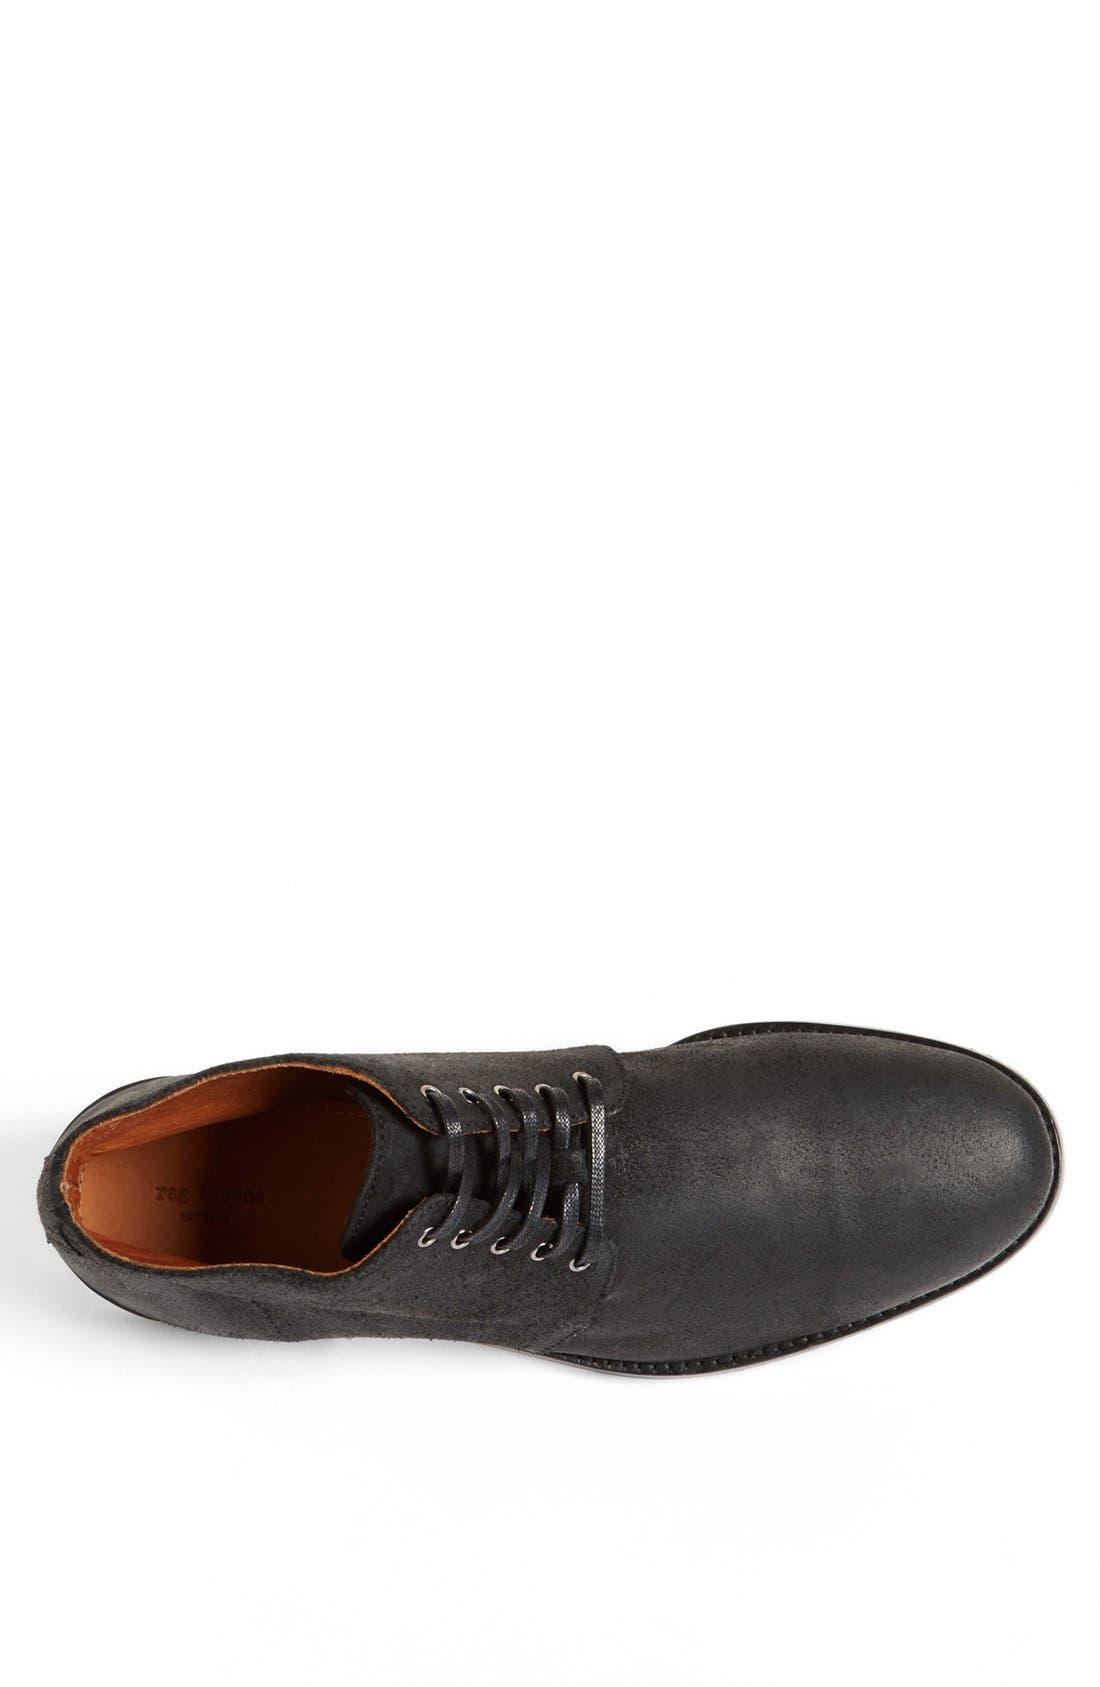 Alternate Image 3  - rag & bone 'Archer' Plain Toe Suede Boot